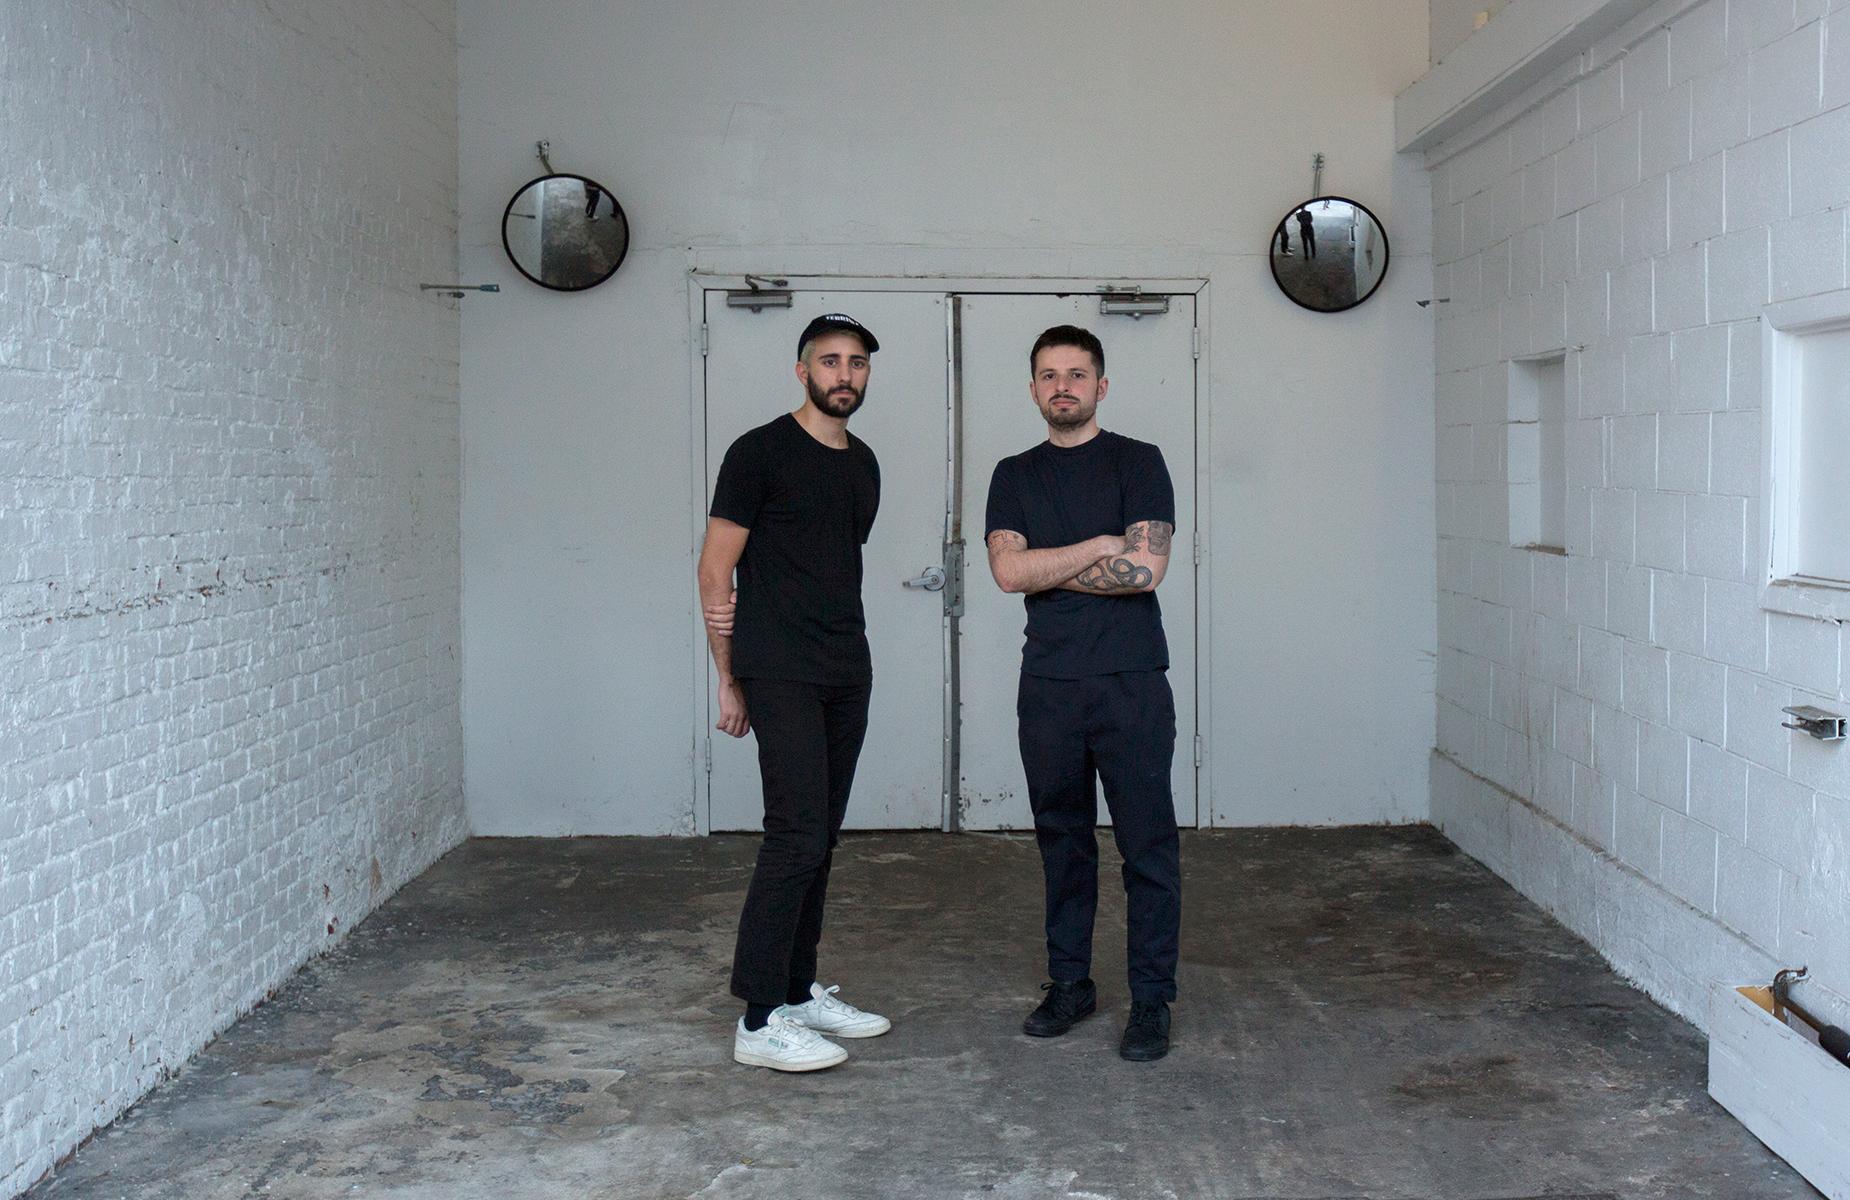 Leo Porter & Felipe Rocha, the founders of Bonde